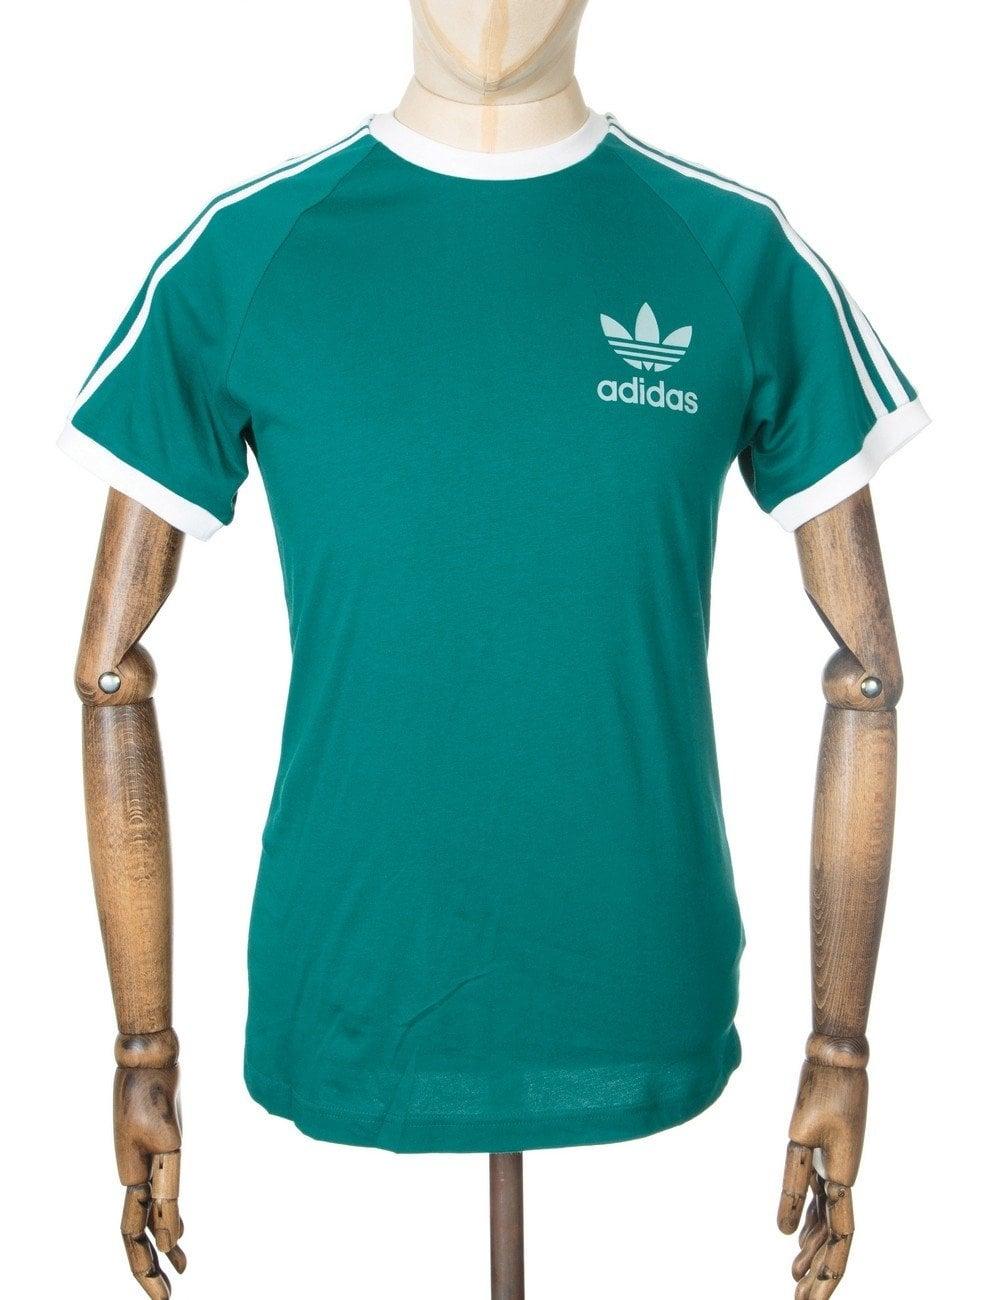 Retro trefoil logo t shirt emerald clothing from fat for Retro t shirts uk